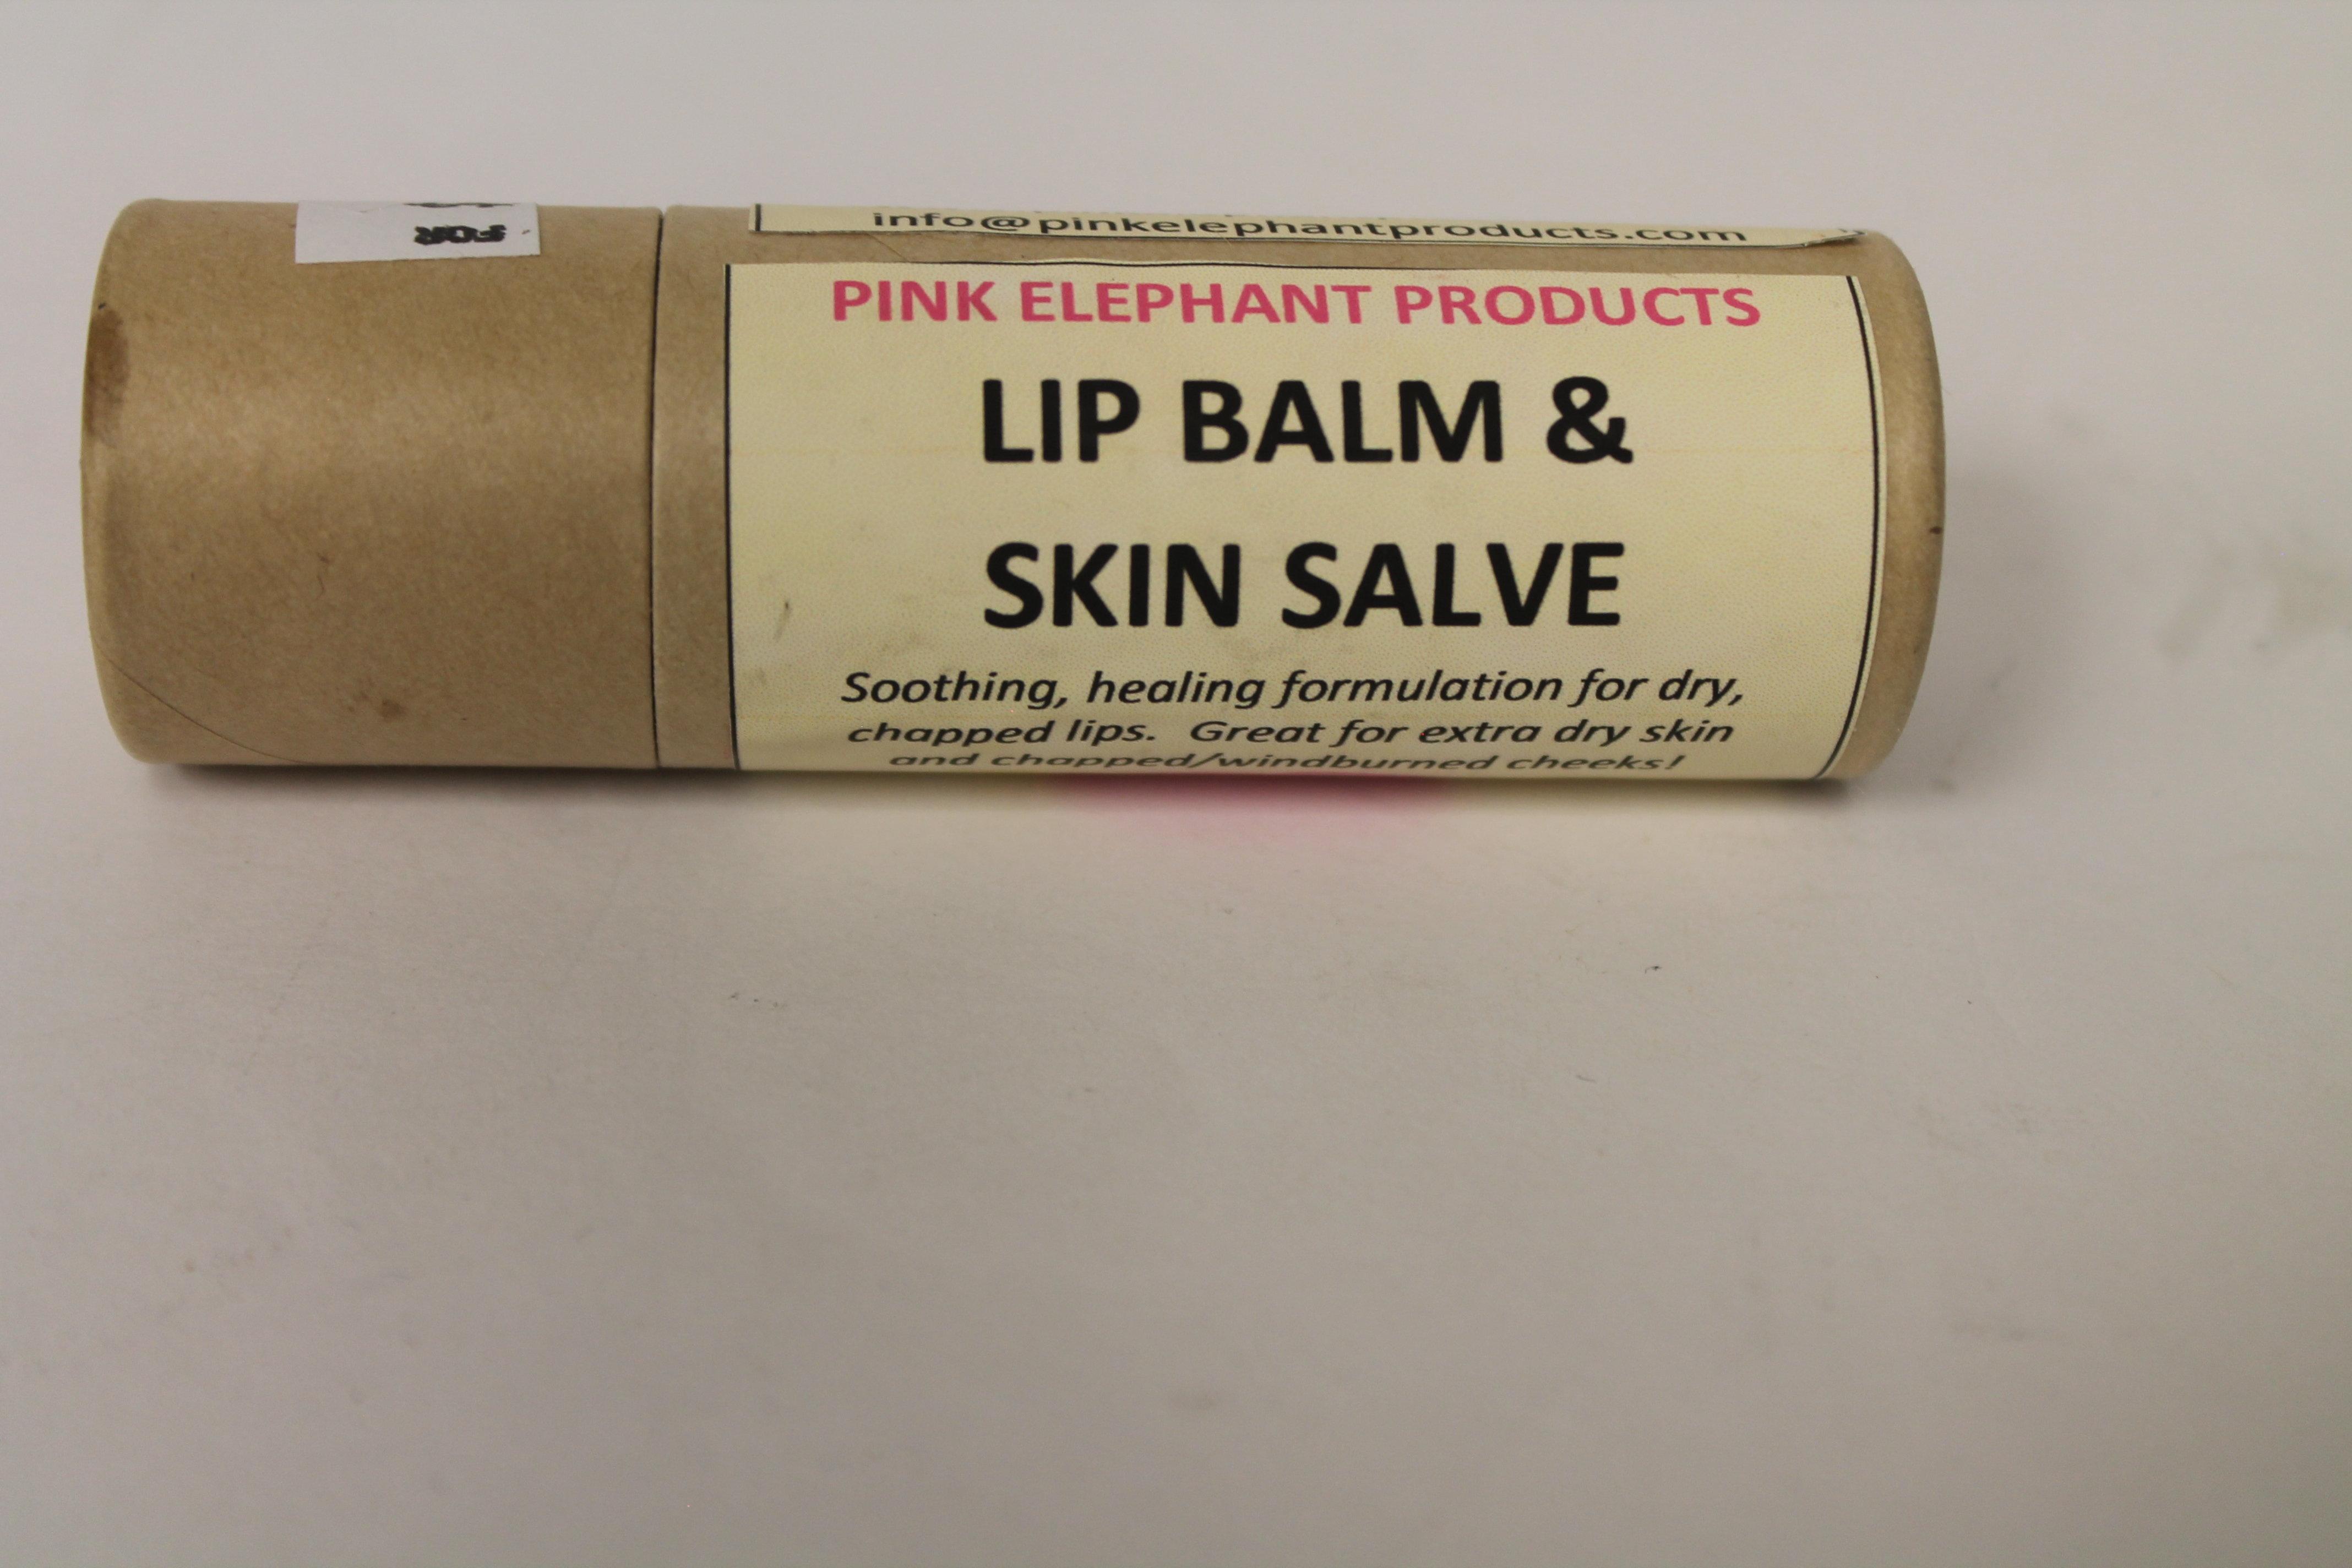 Pink Elephant Lip Balm & Skin Salve 00220